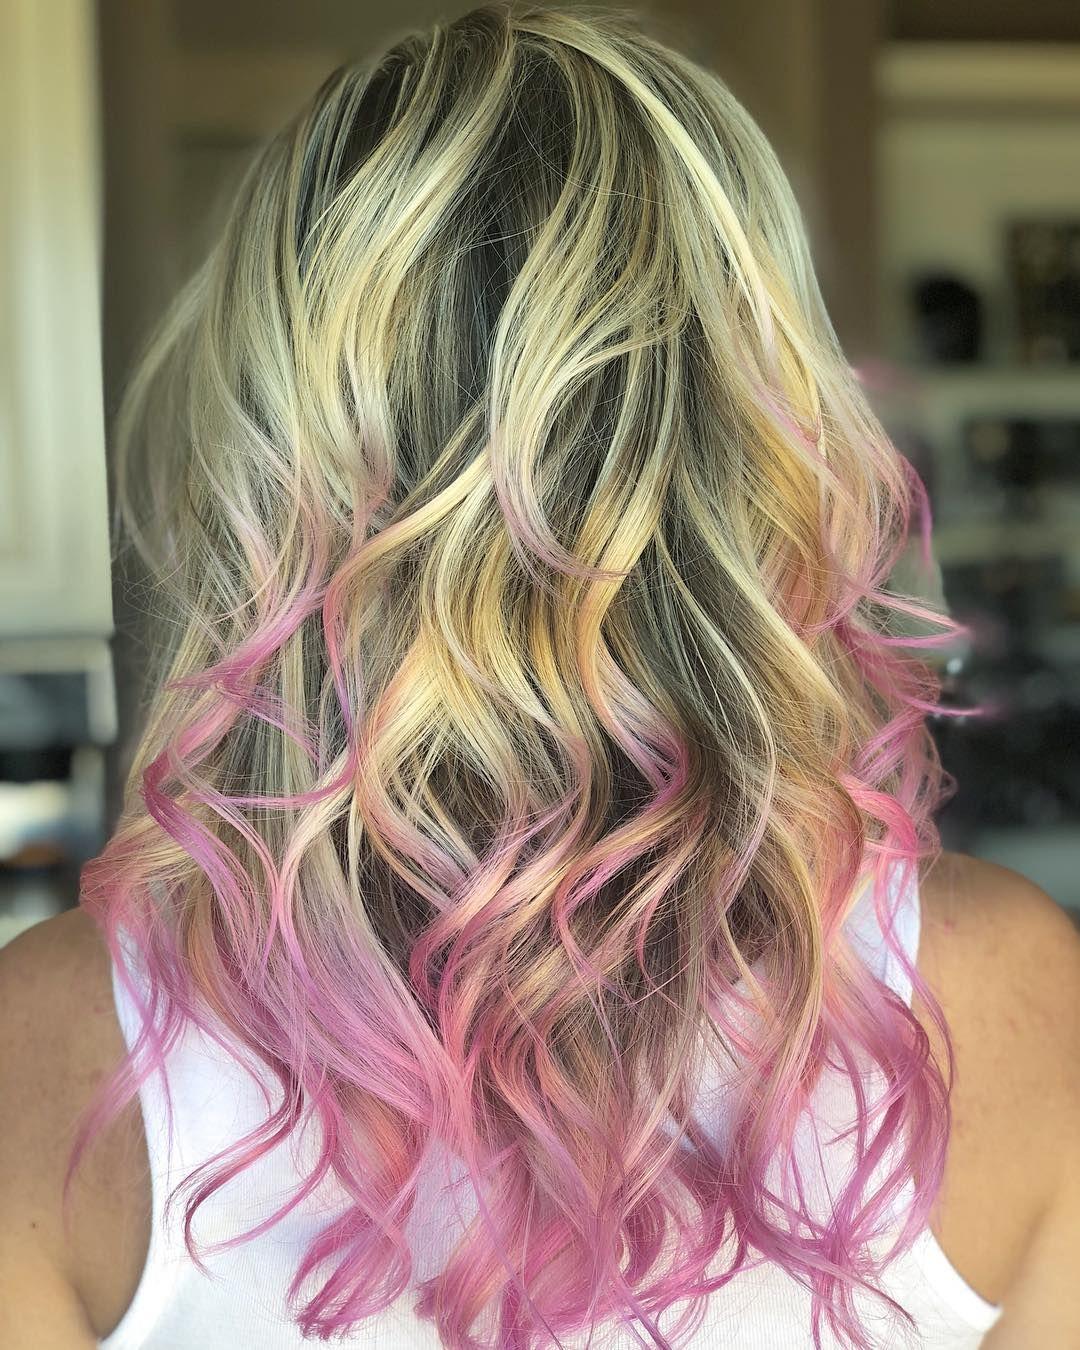 Pin On Dyed Hair